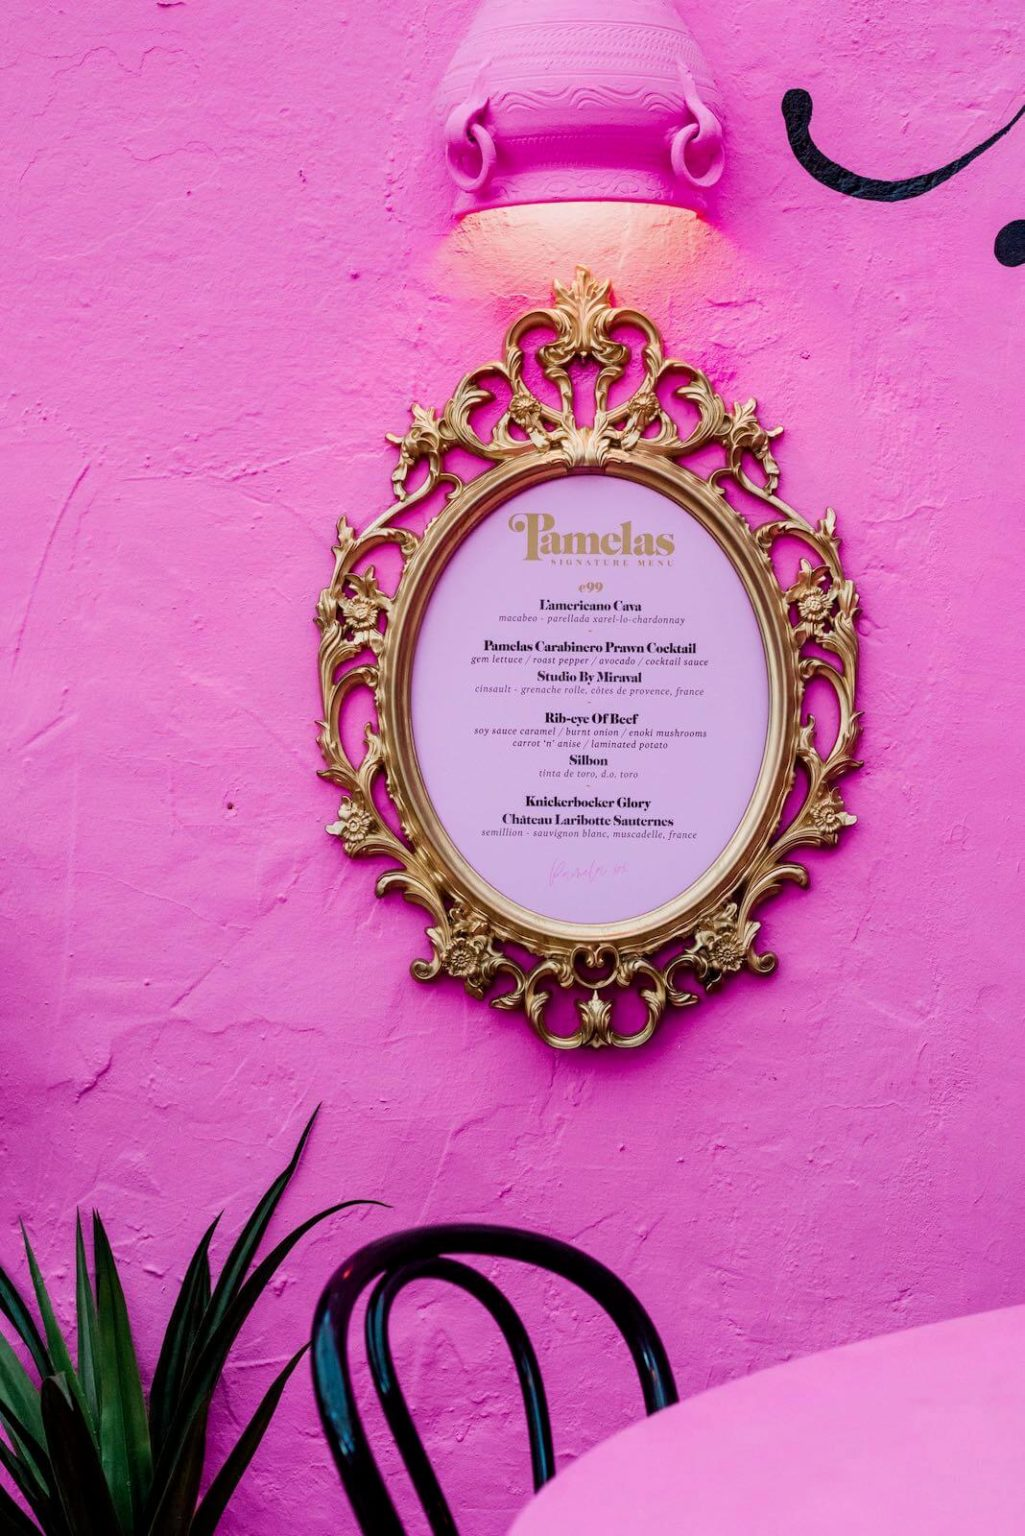 https://www.white-ibiza.com/wp-content/uploads/2020/03/ibiza-restaurant-pamelas-at-pikes-ibiza-2020-08-1025x1536.jpeg